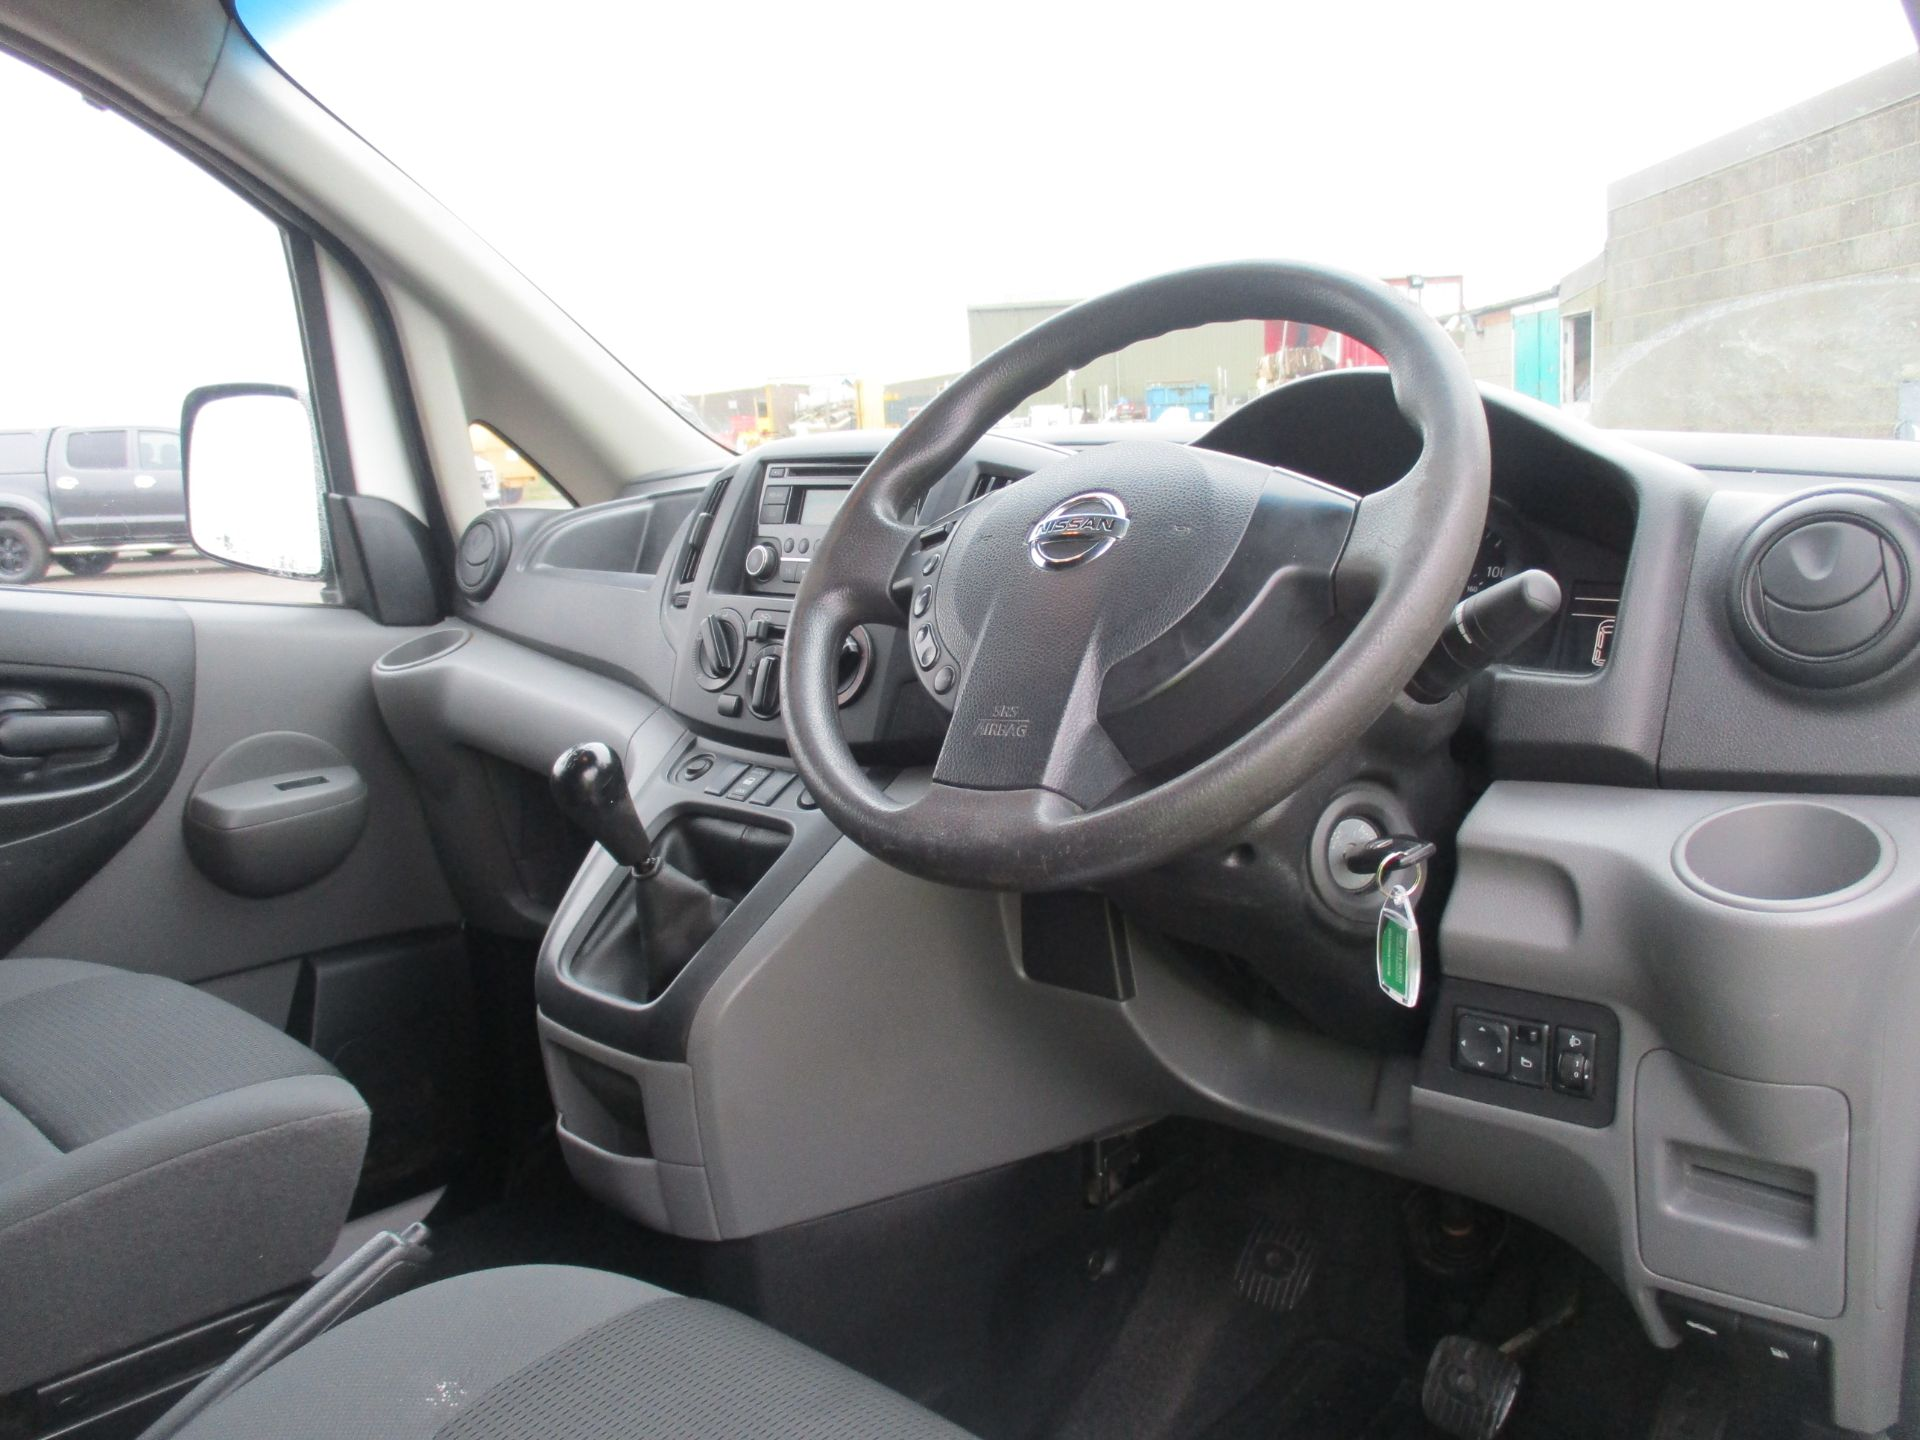 2014 Nissan Nv200 1.5 DCI ACENTA EURO 5 (SJ14YBR) Image 14